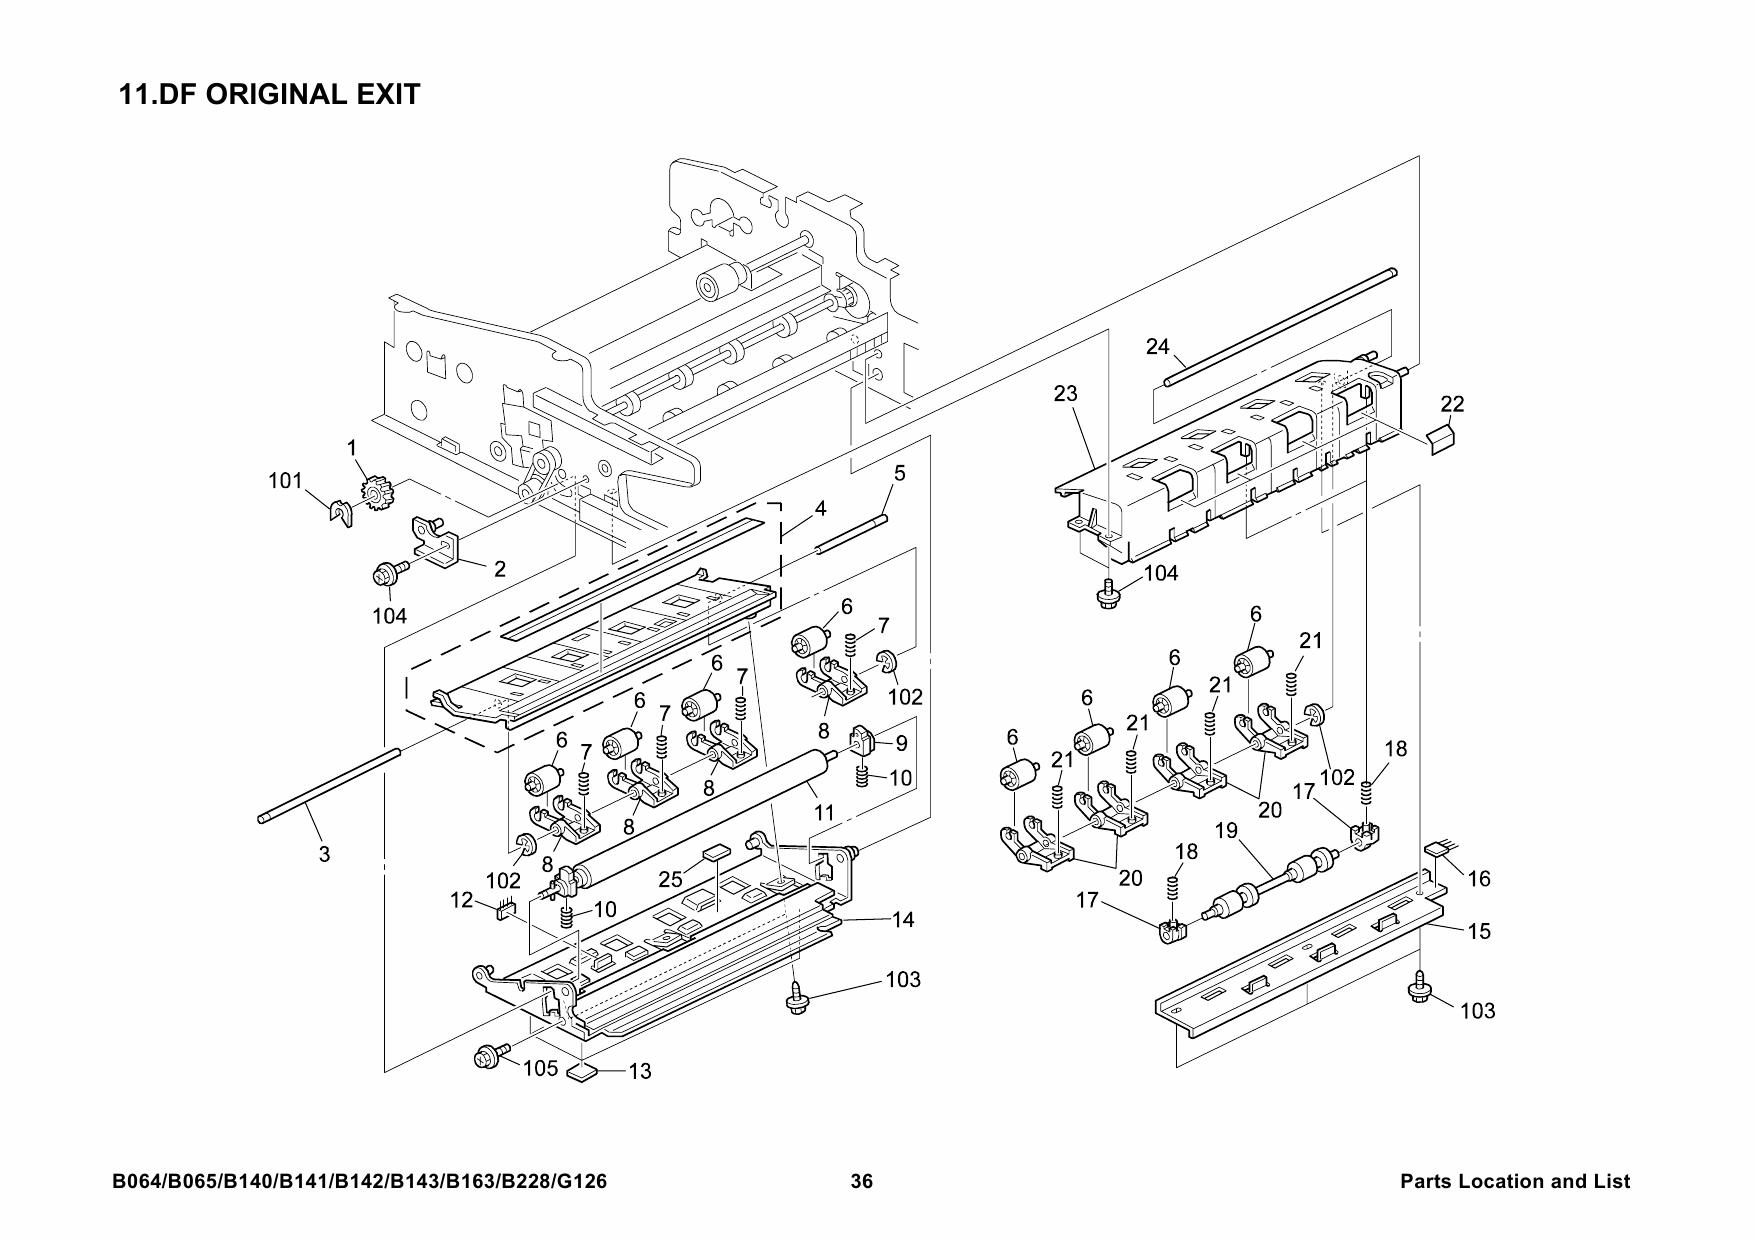 ricoh mp c3003 manual pdf